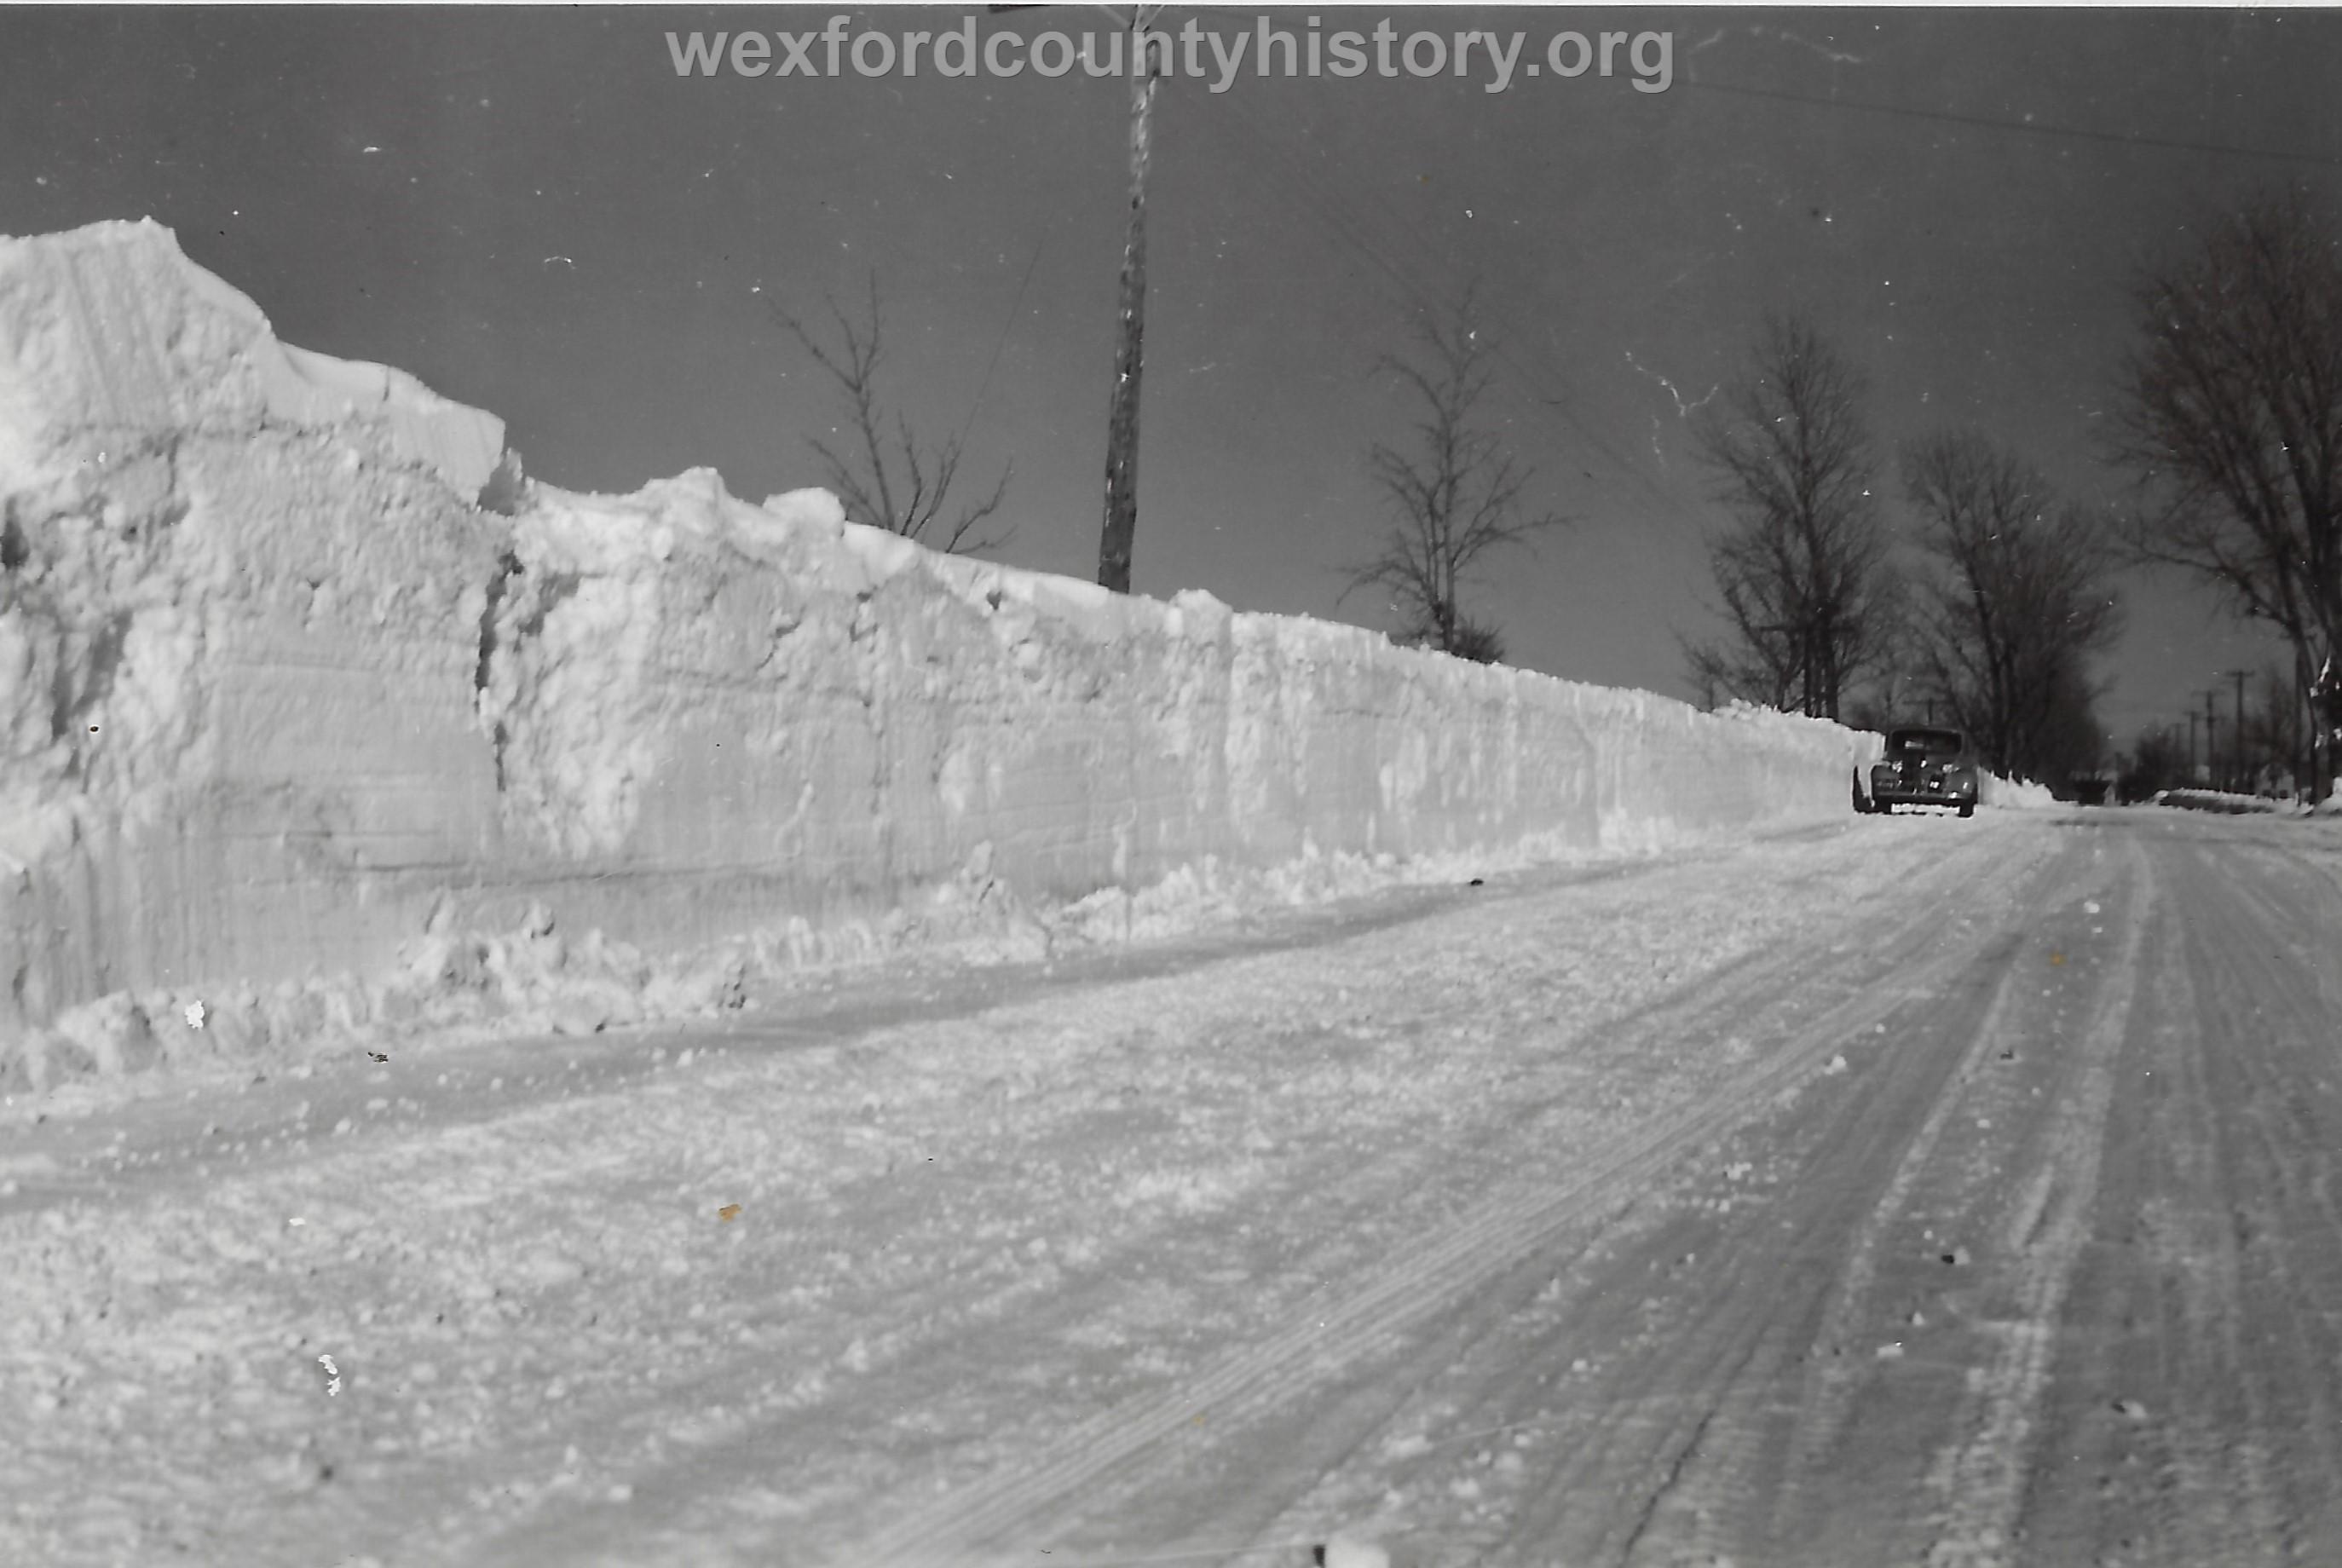 Cadillac-Weather-Winter-Scene-4